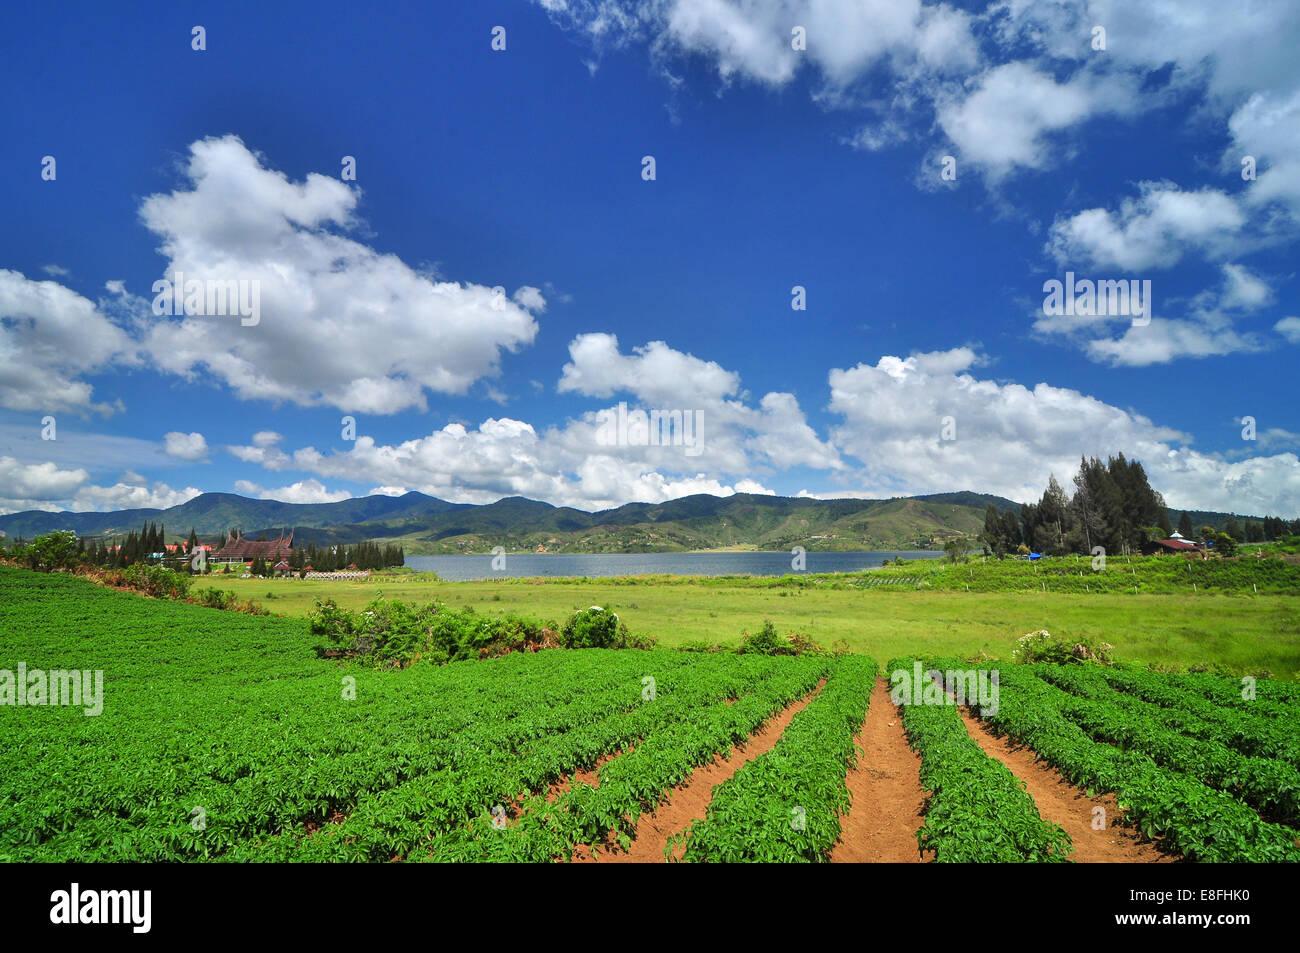 Indonesien, West-Sumatra, Solok, Alahan Panjang, Wolken über Feld Stockbild